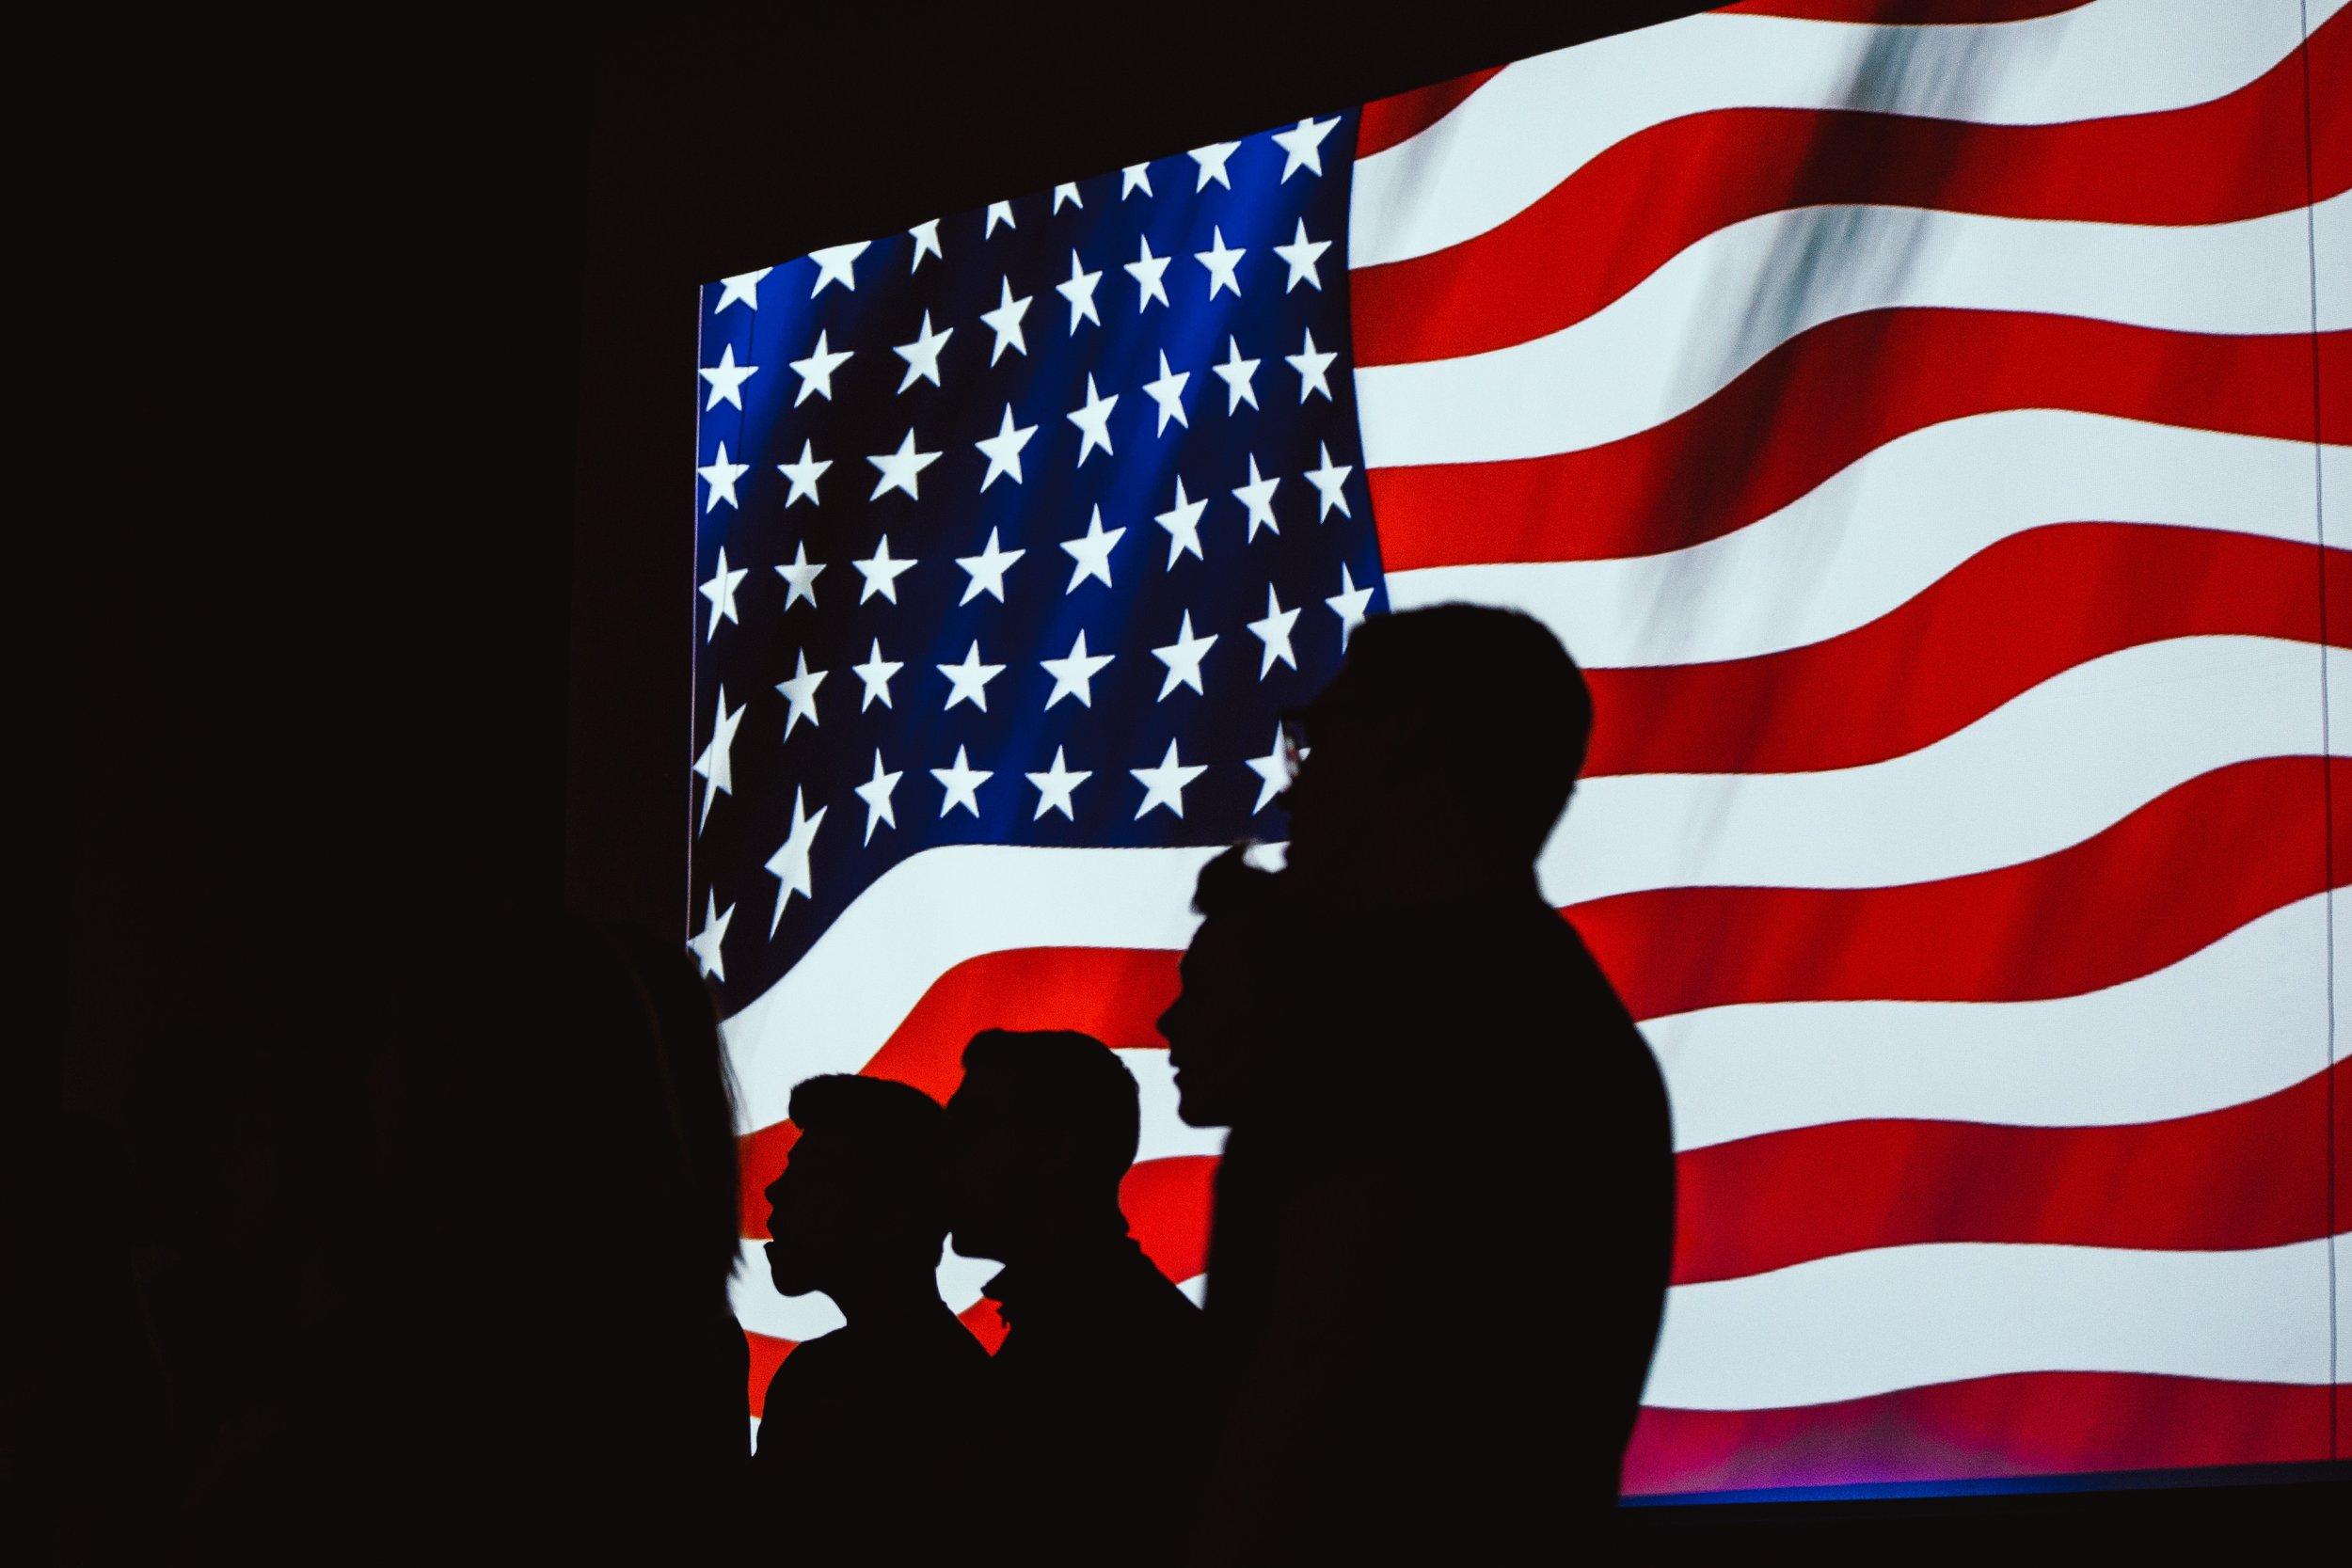 administration-american-flag-background-1046398.jpg